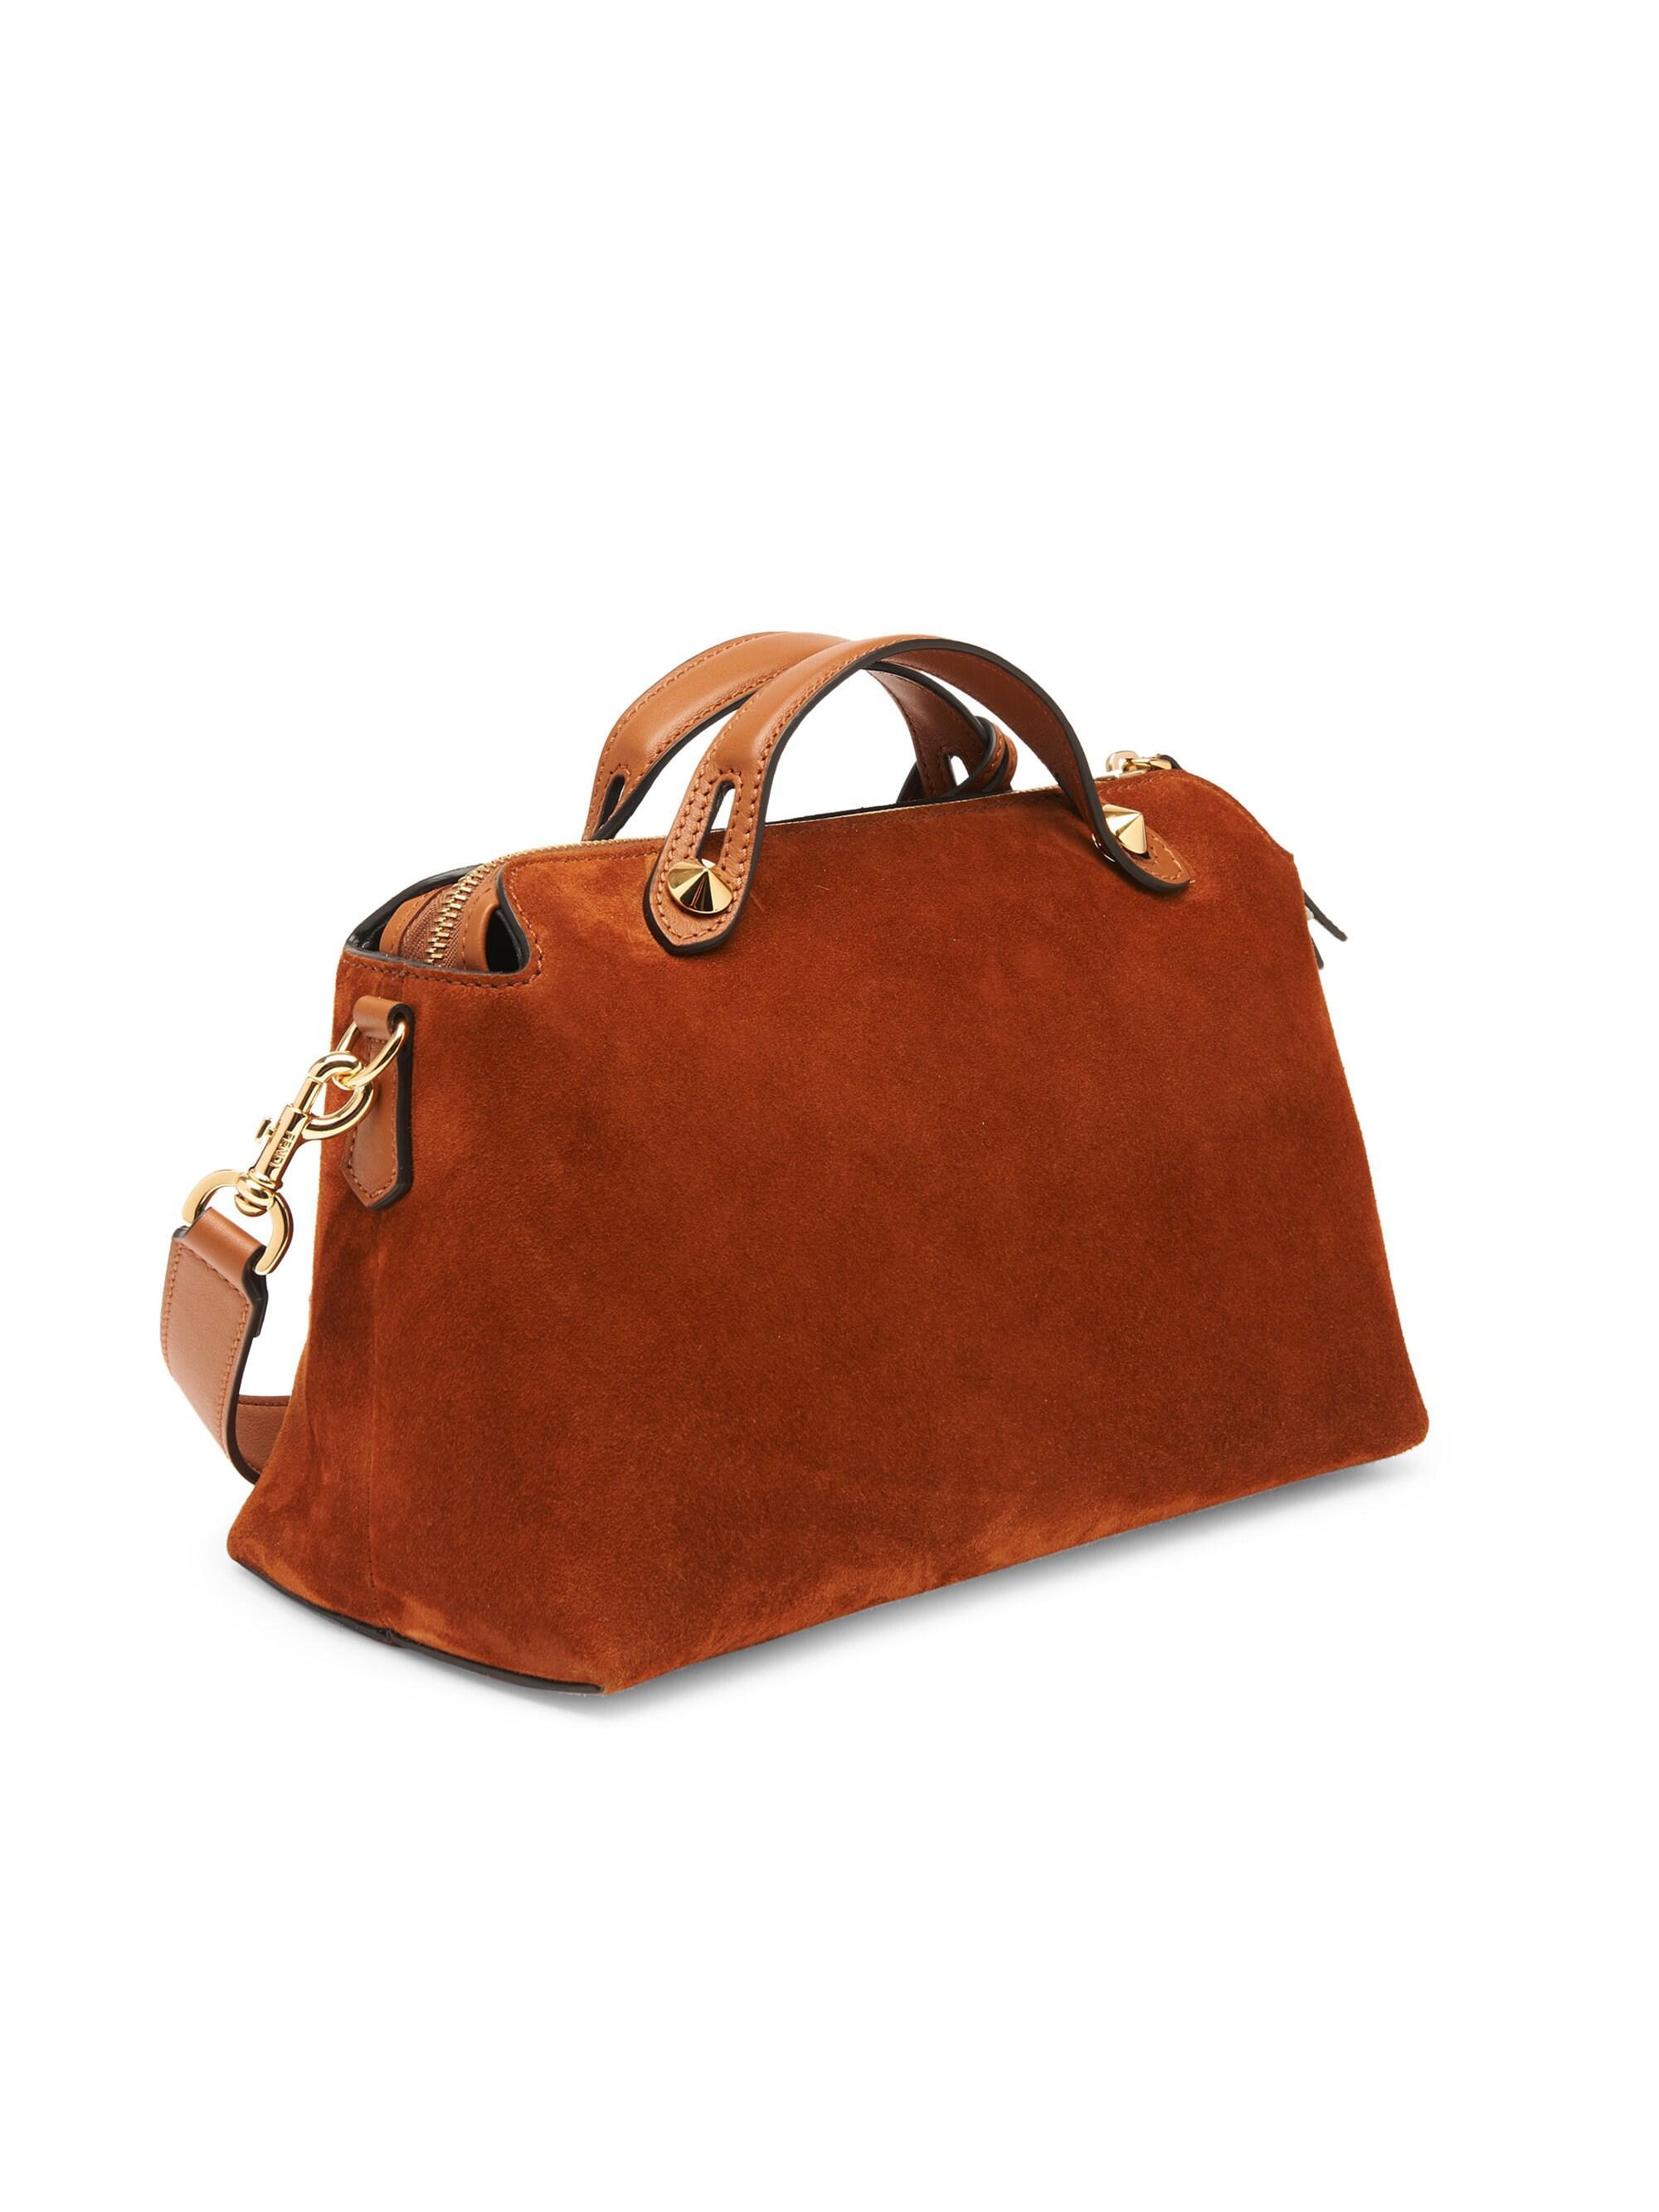 bc8402802890 Fendi Women s Medium By The Way Suede Shoulder Bag - Tan in Brown - Lyst